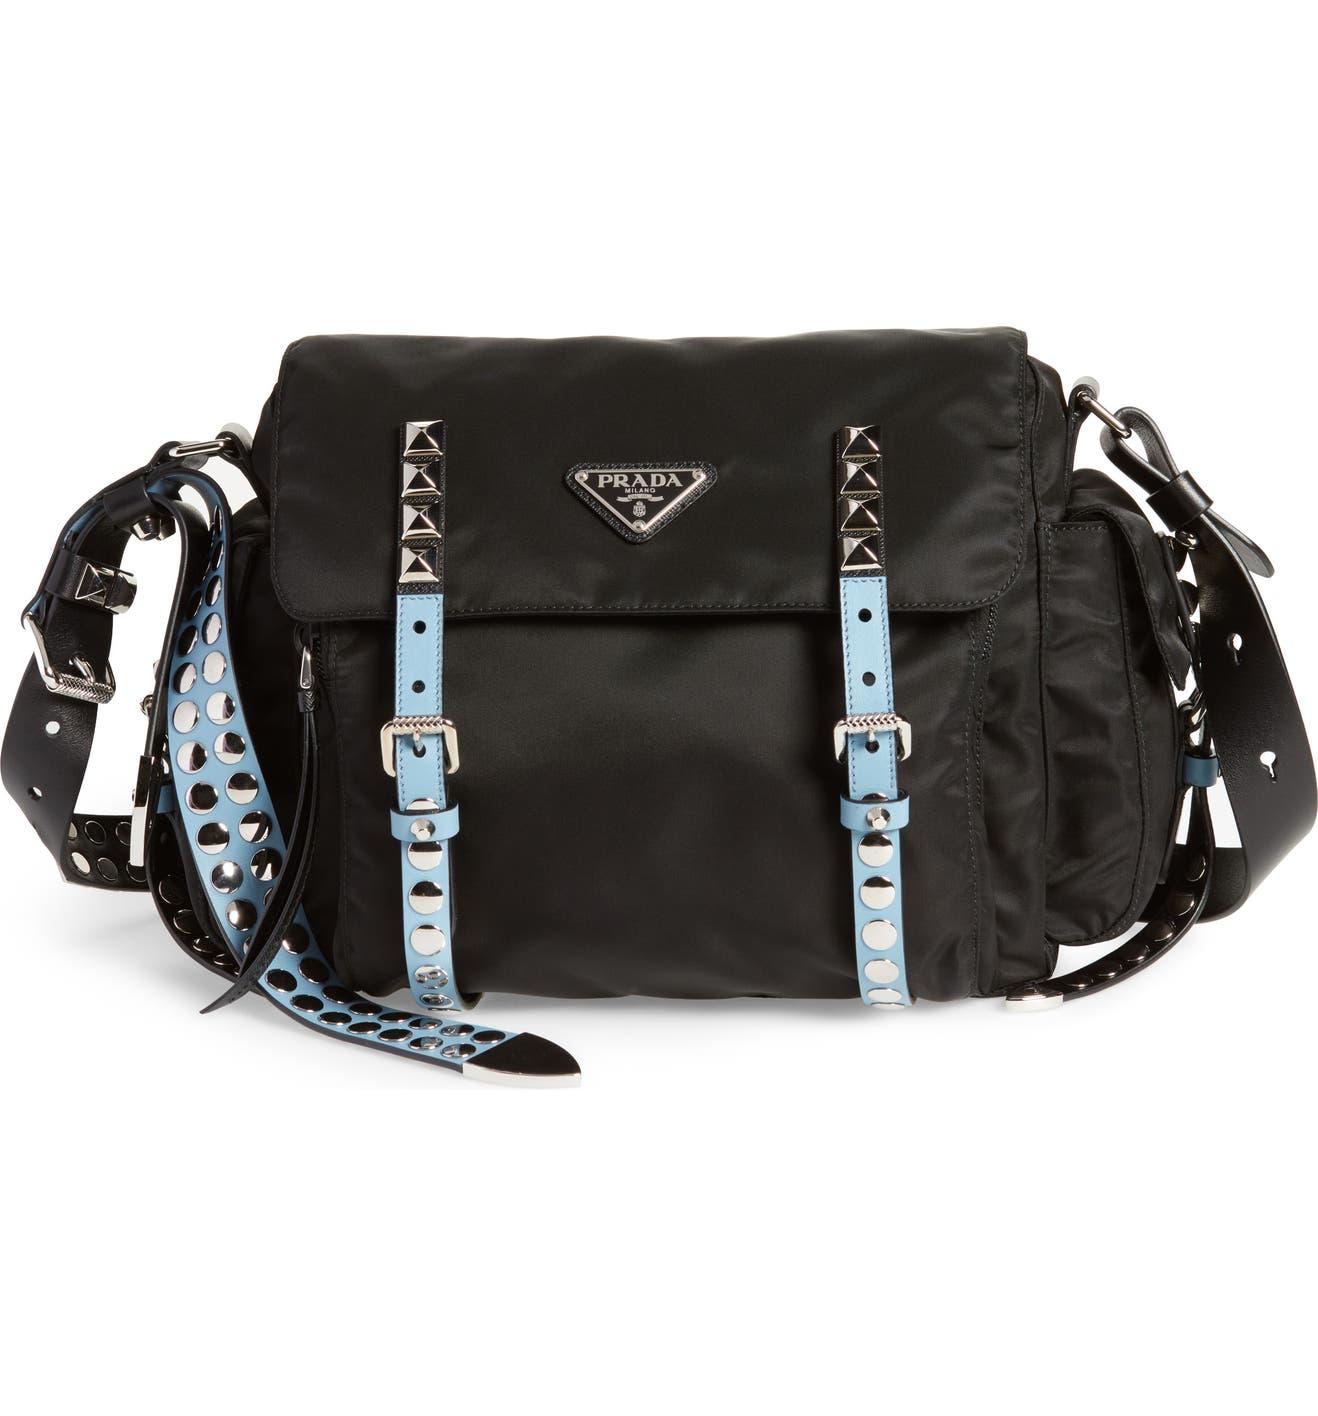 3a4826a487c7d6 Prada Studded Nylon Messenger Bag | Nordstrom